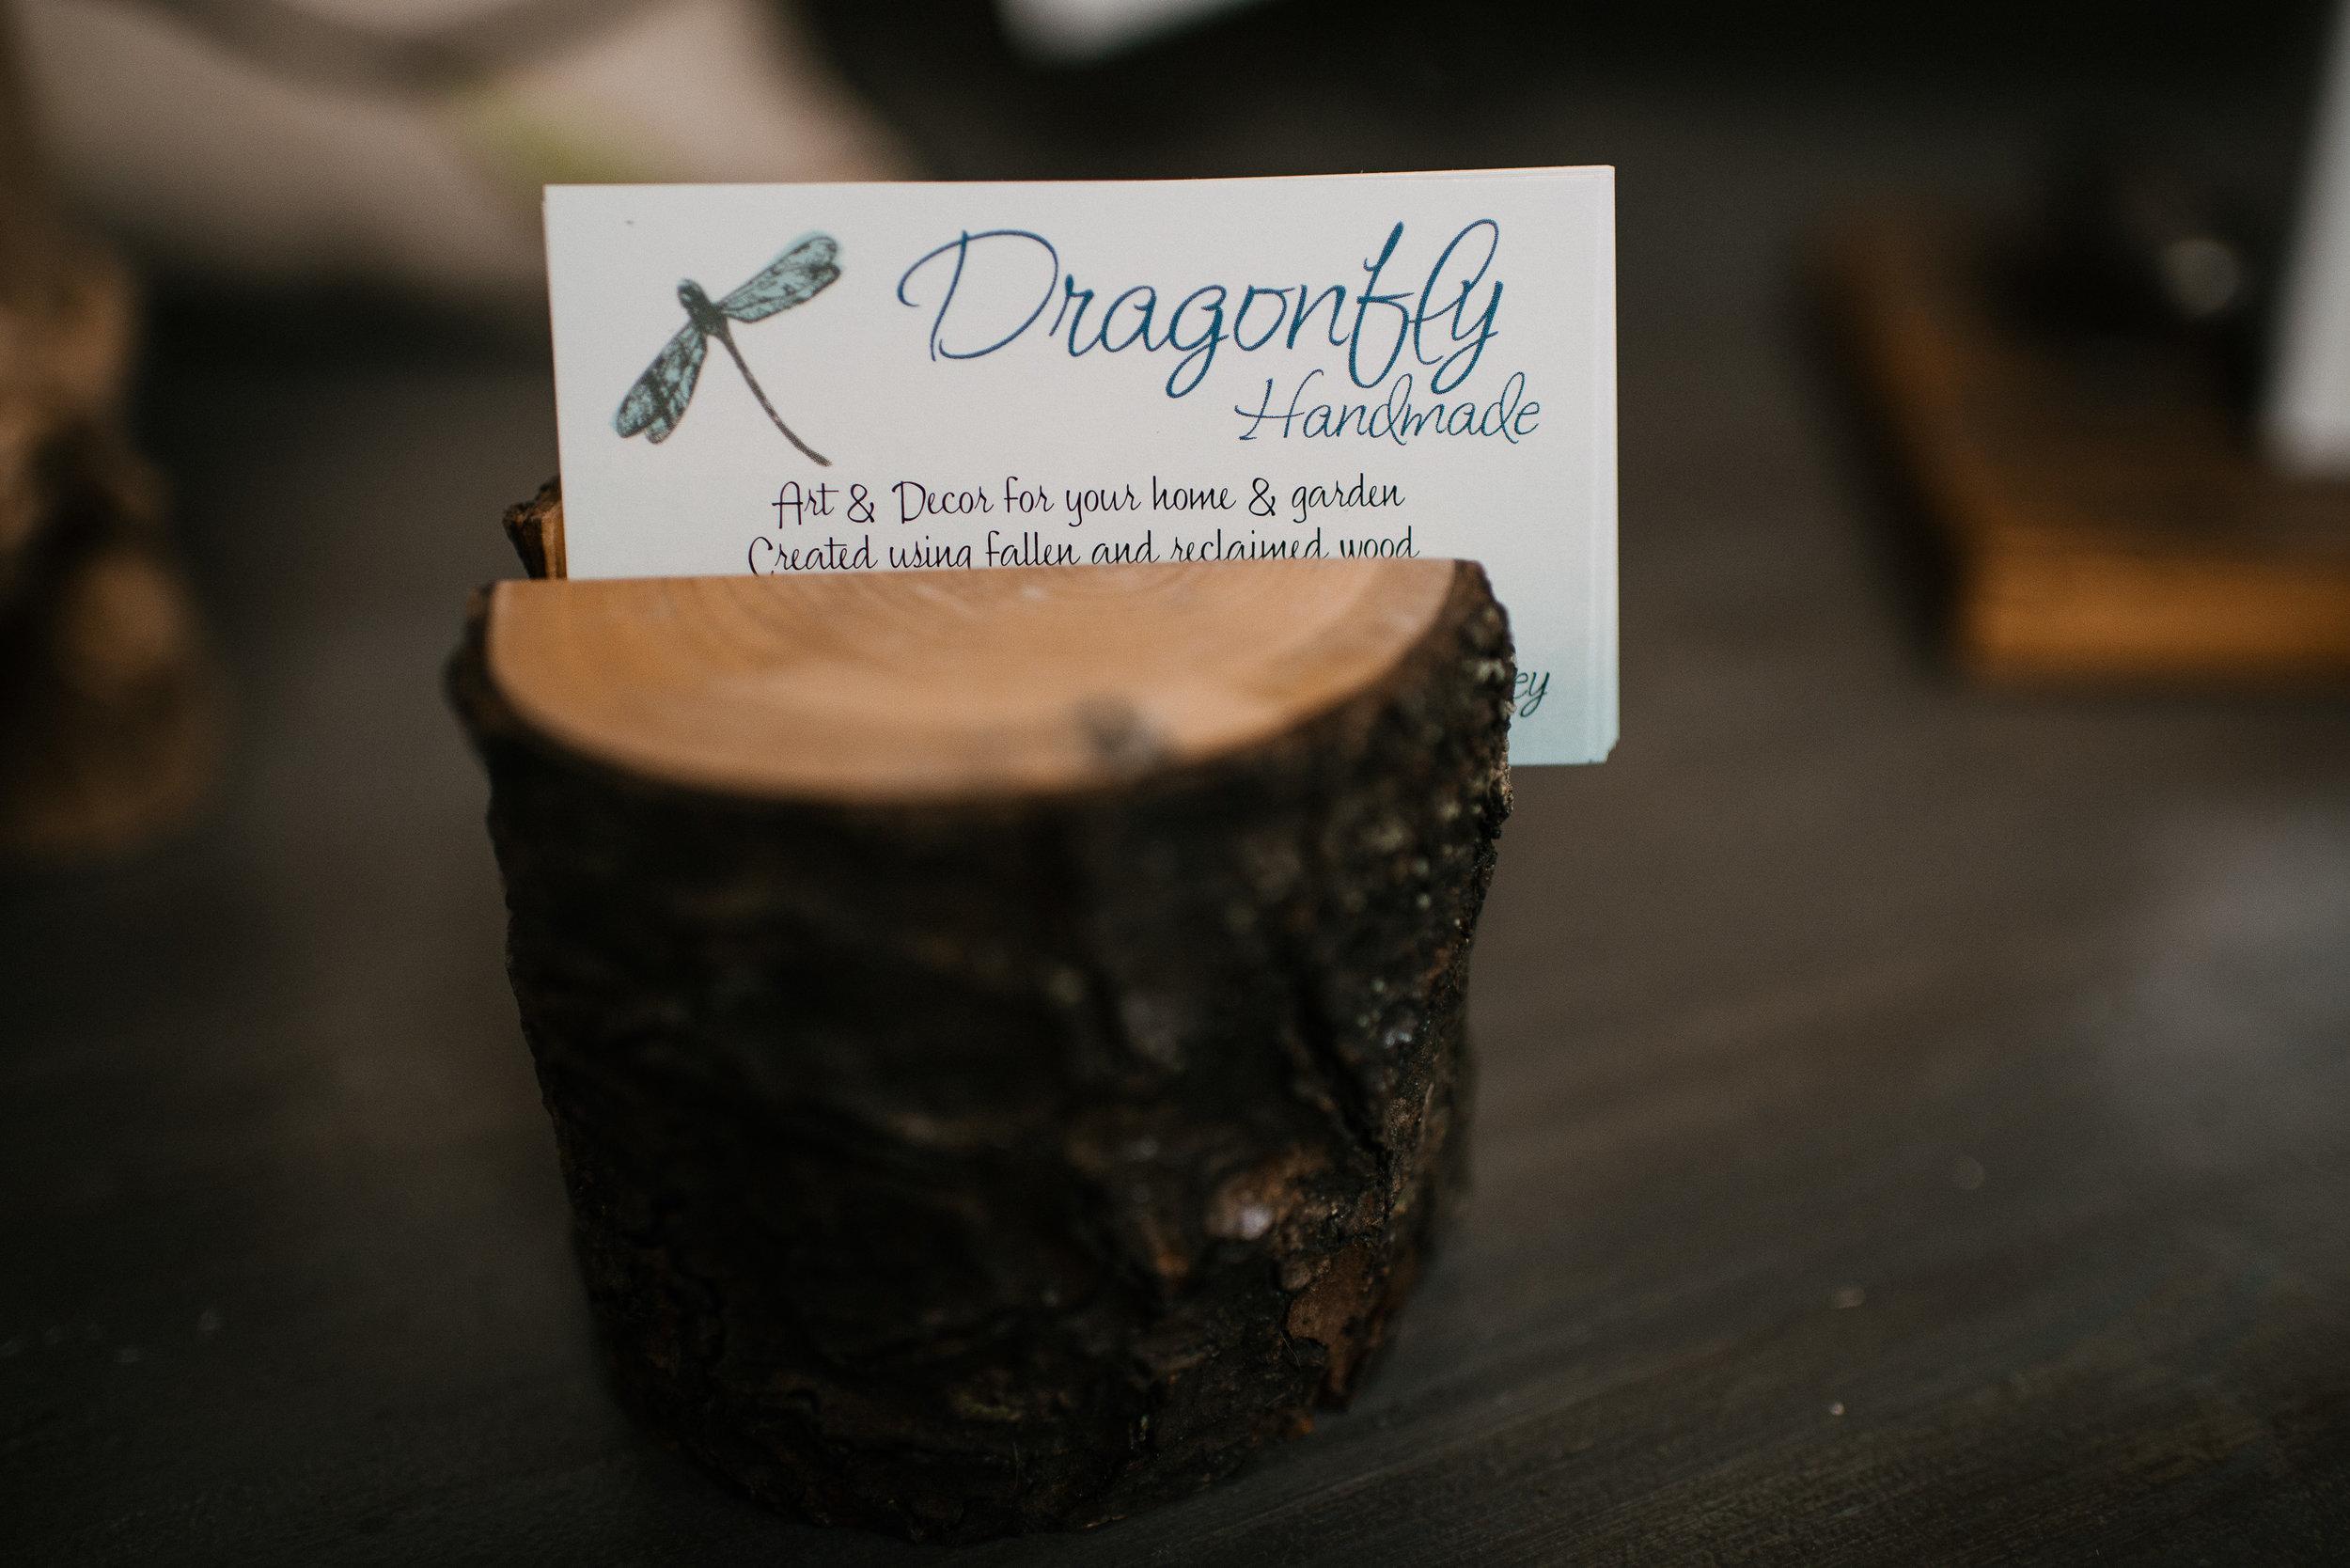 Lisa Morrissey Dragonfly Handmade-124002vm.jpg